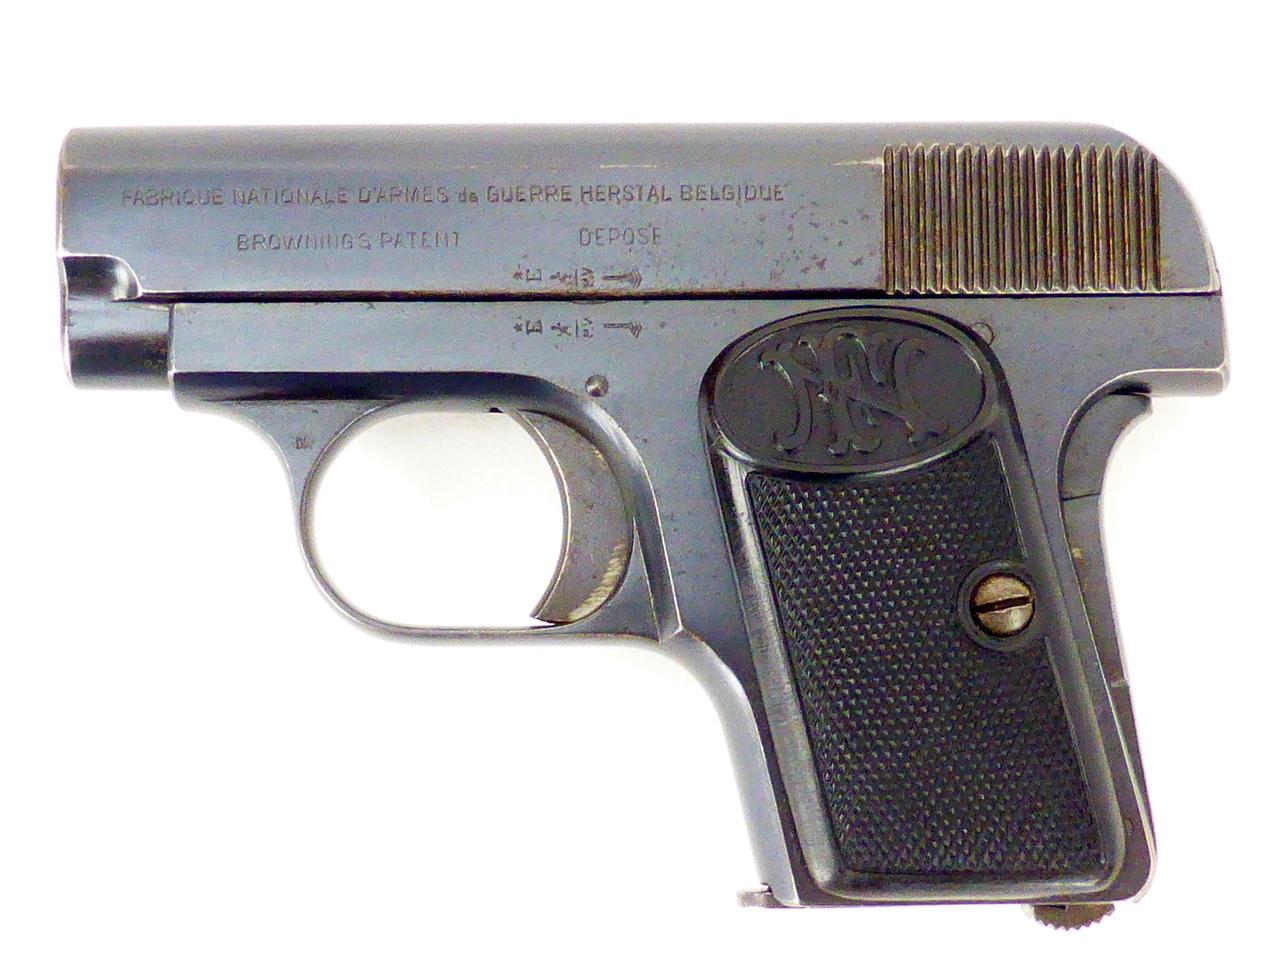 FN Browning Modell 1906 Pistol